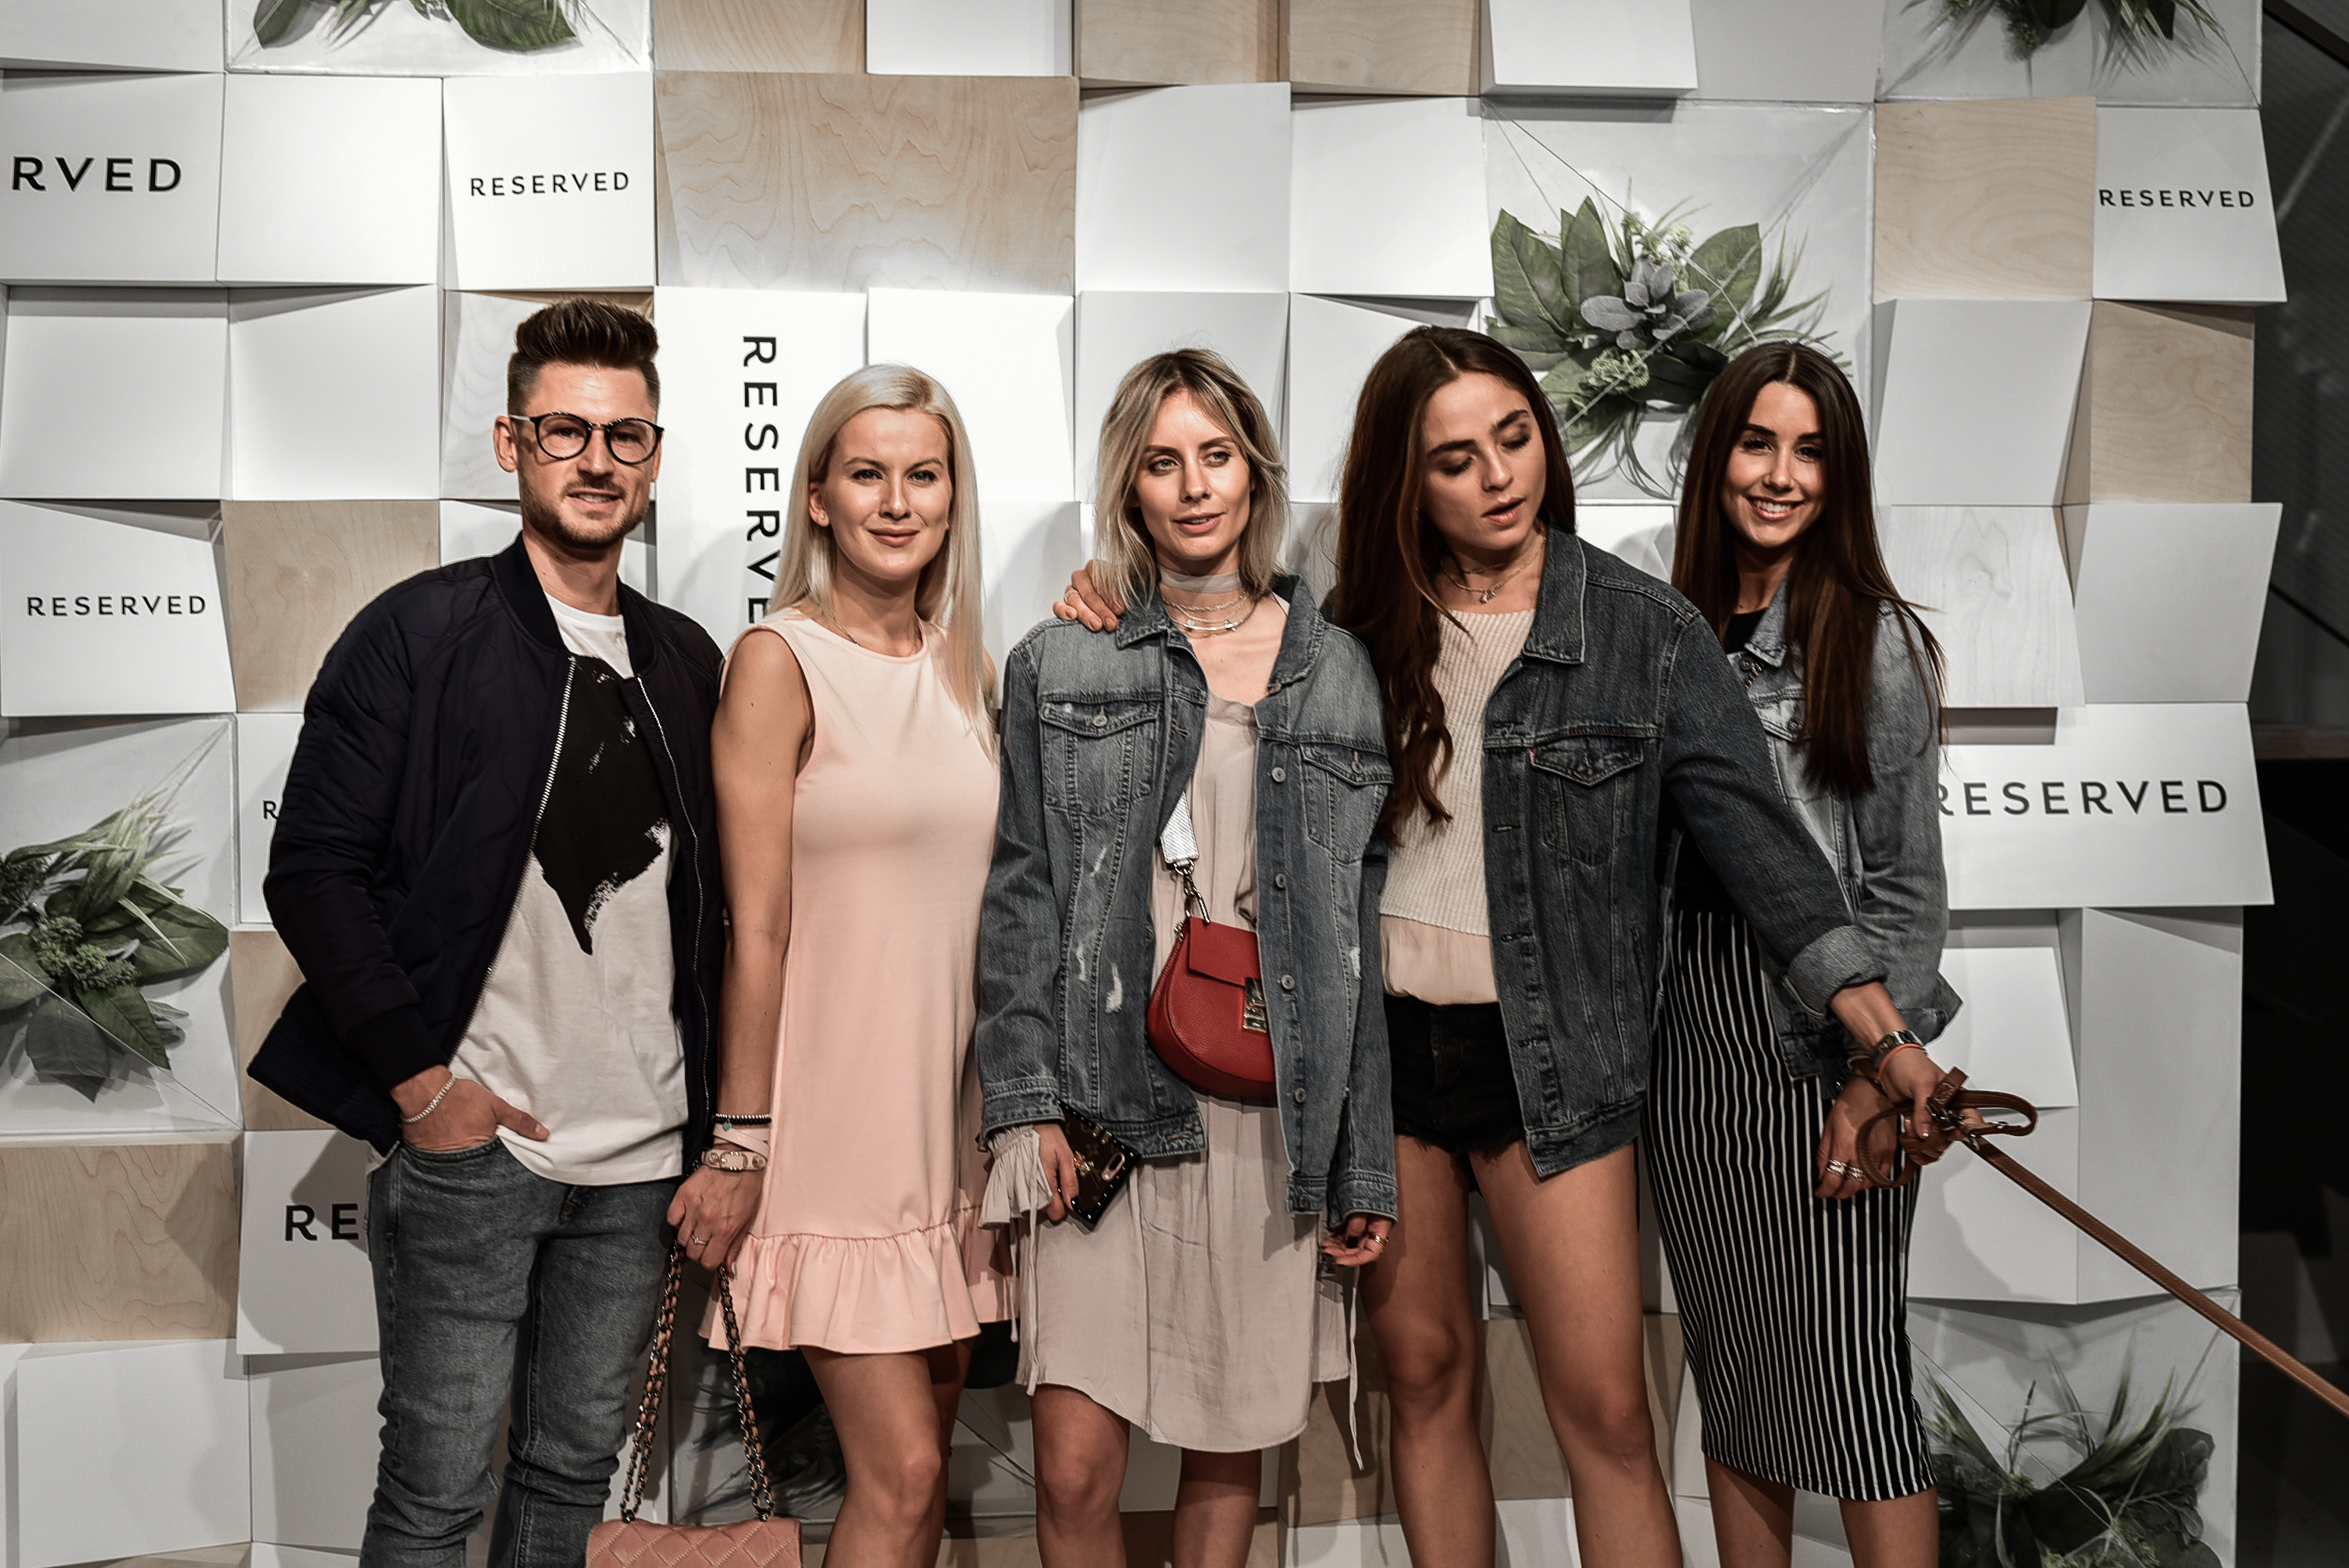 Tommeezjerry-Maennermodeblog-Maennermode-Fashionblog-Styleblog-Berlinblog-Reserved-Store-Opening-Berlin-Streetstyle-Bomberjacket-Blazer